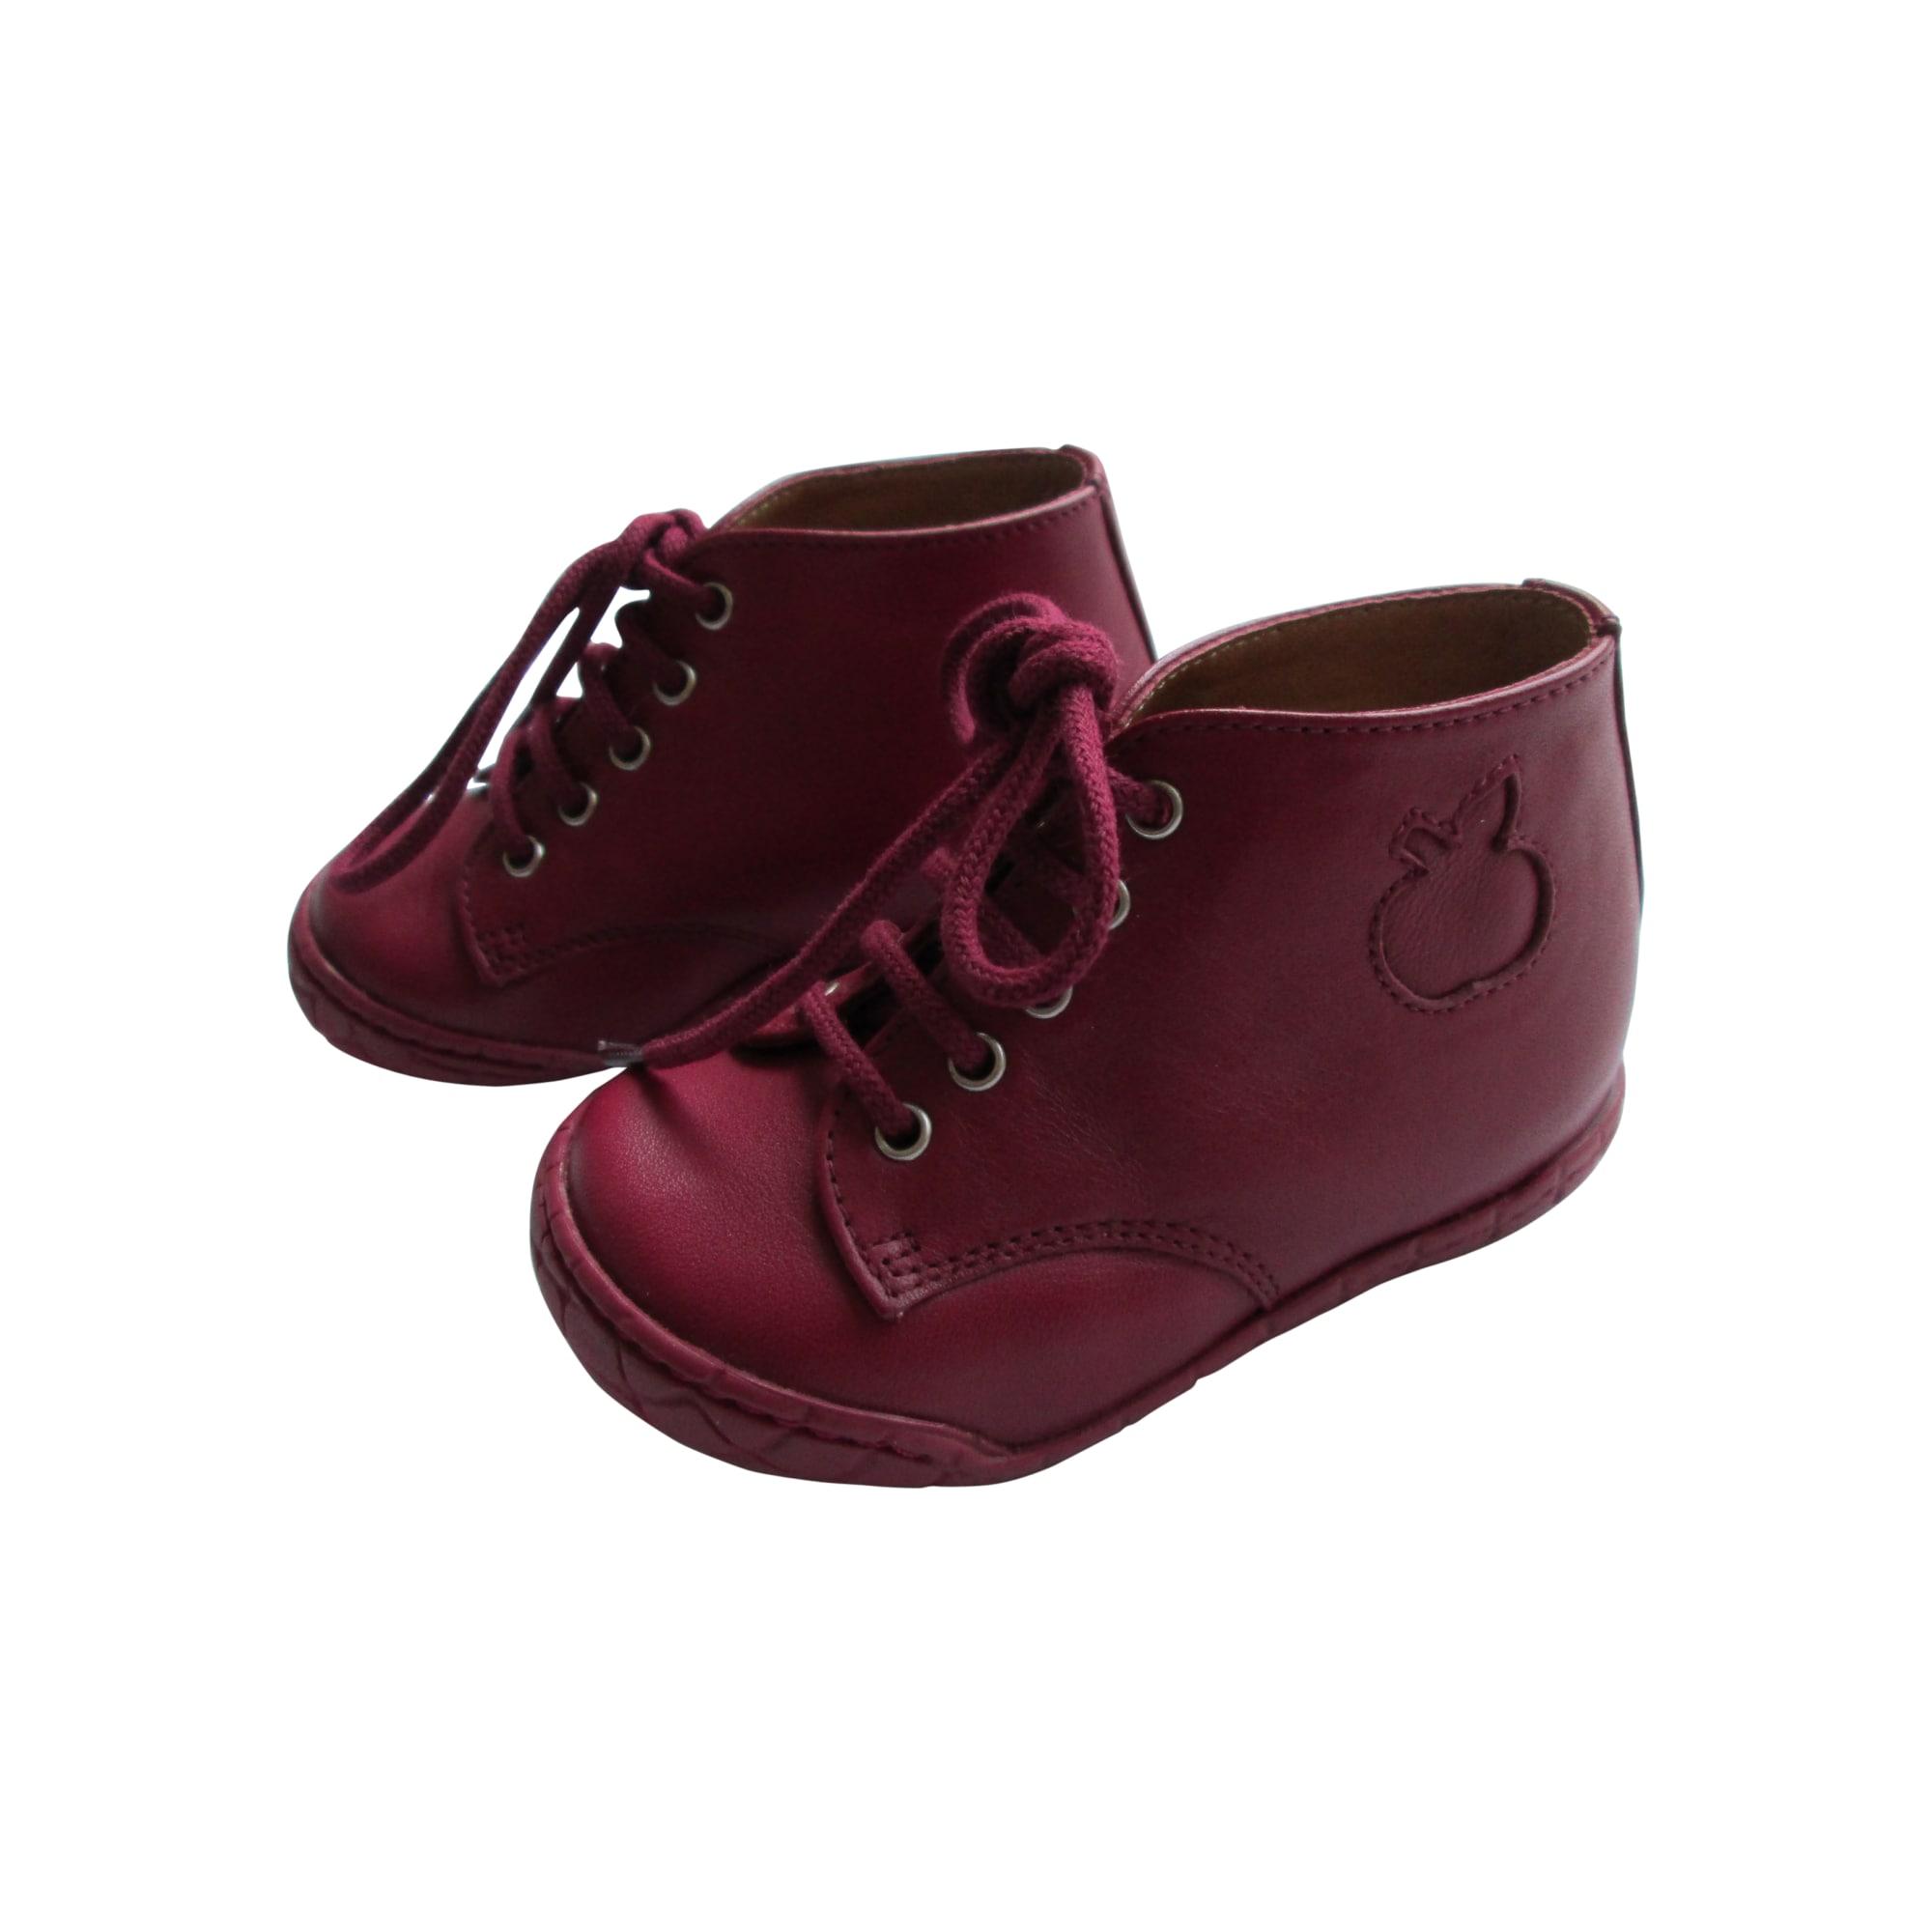 8b95c8bda25f1 Chaussures à lacets POM D API 18 rose - 1847210